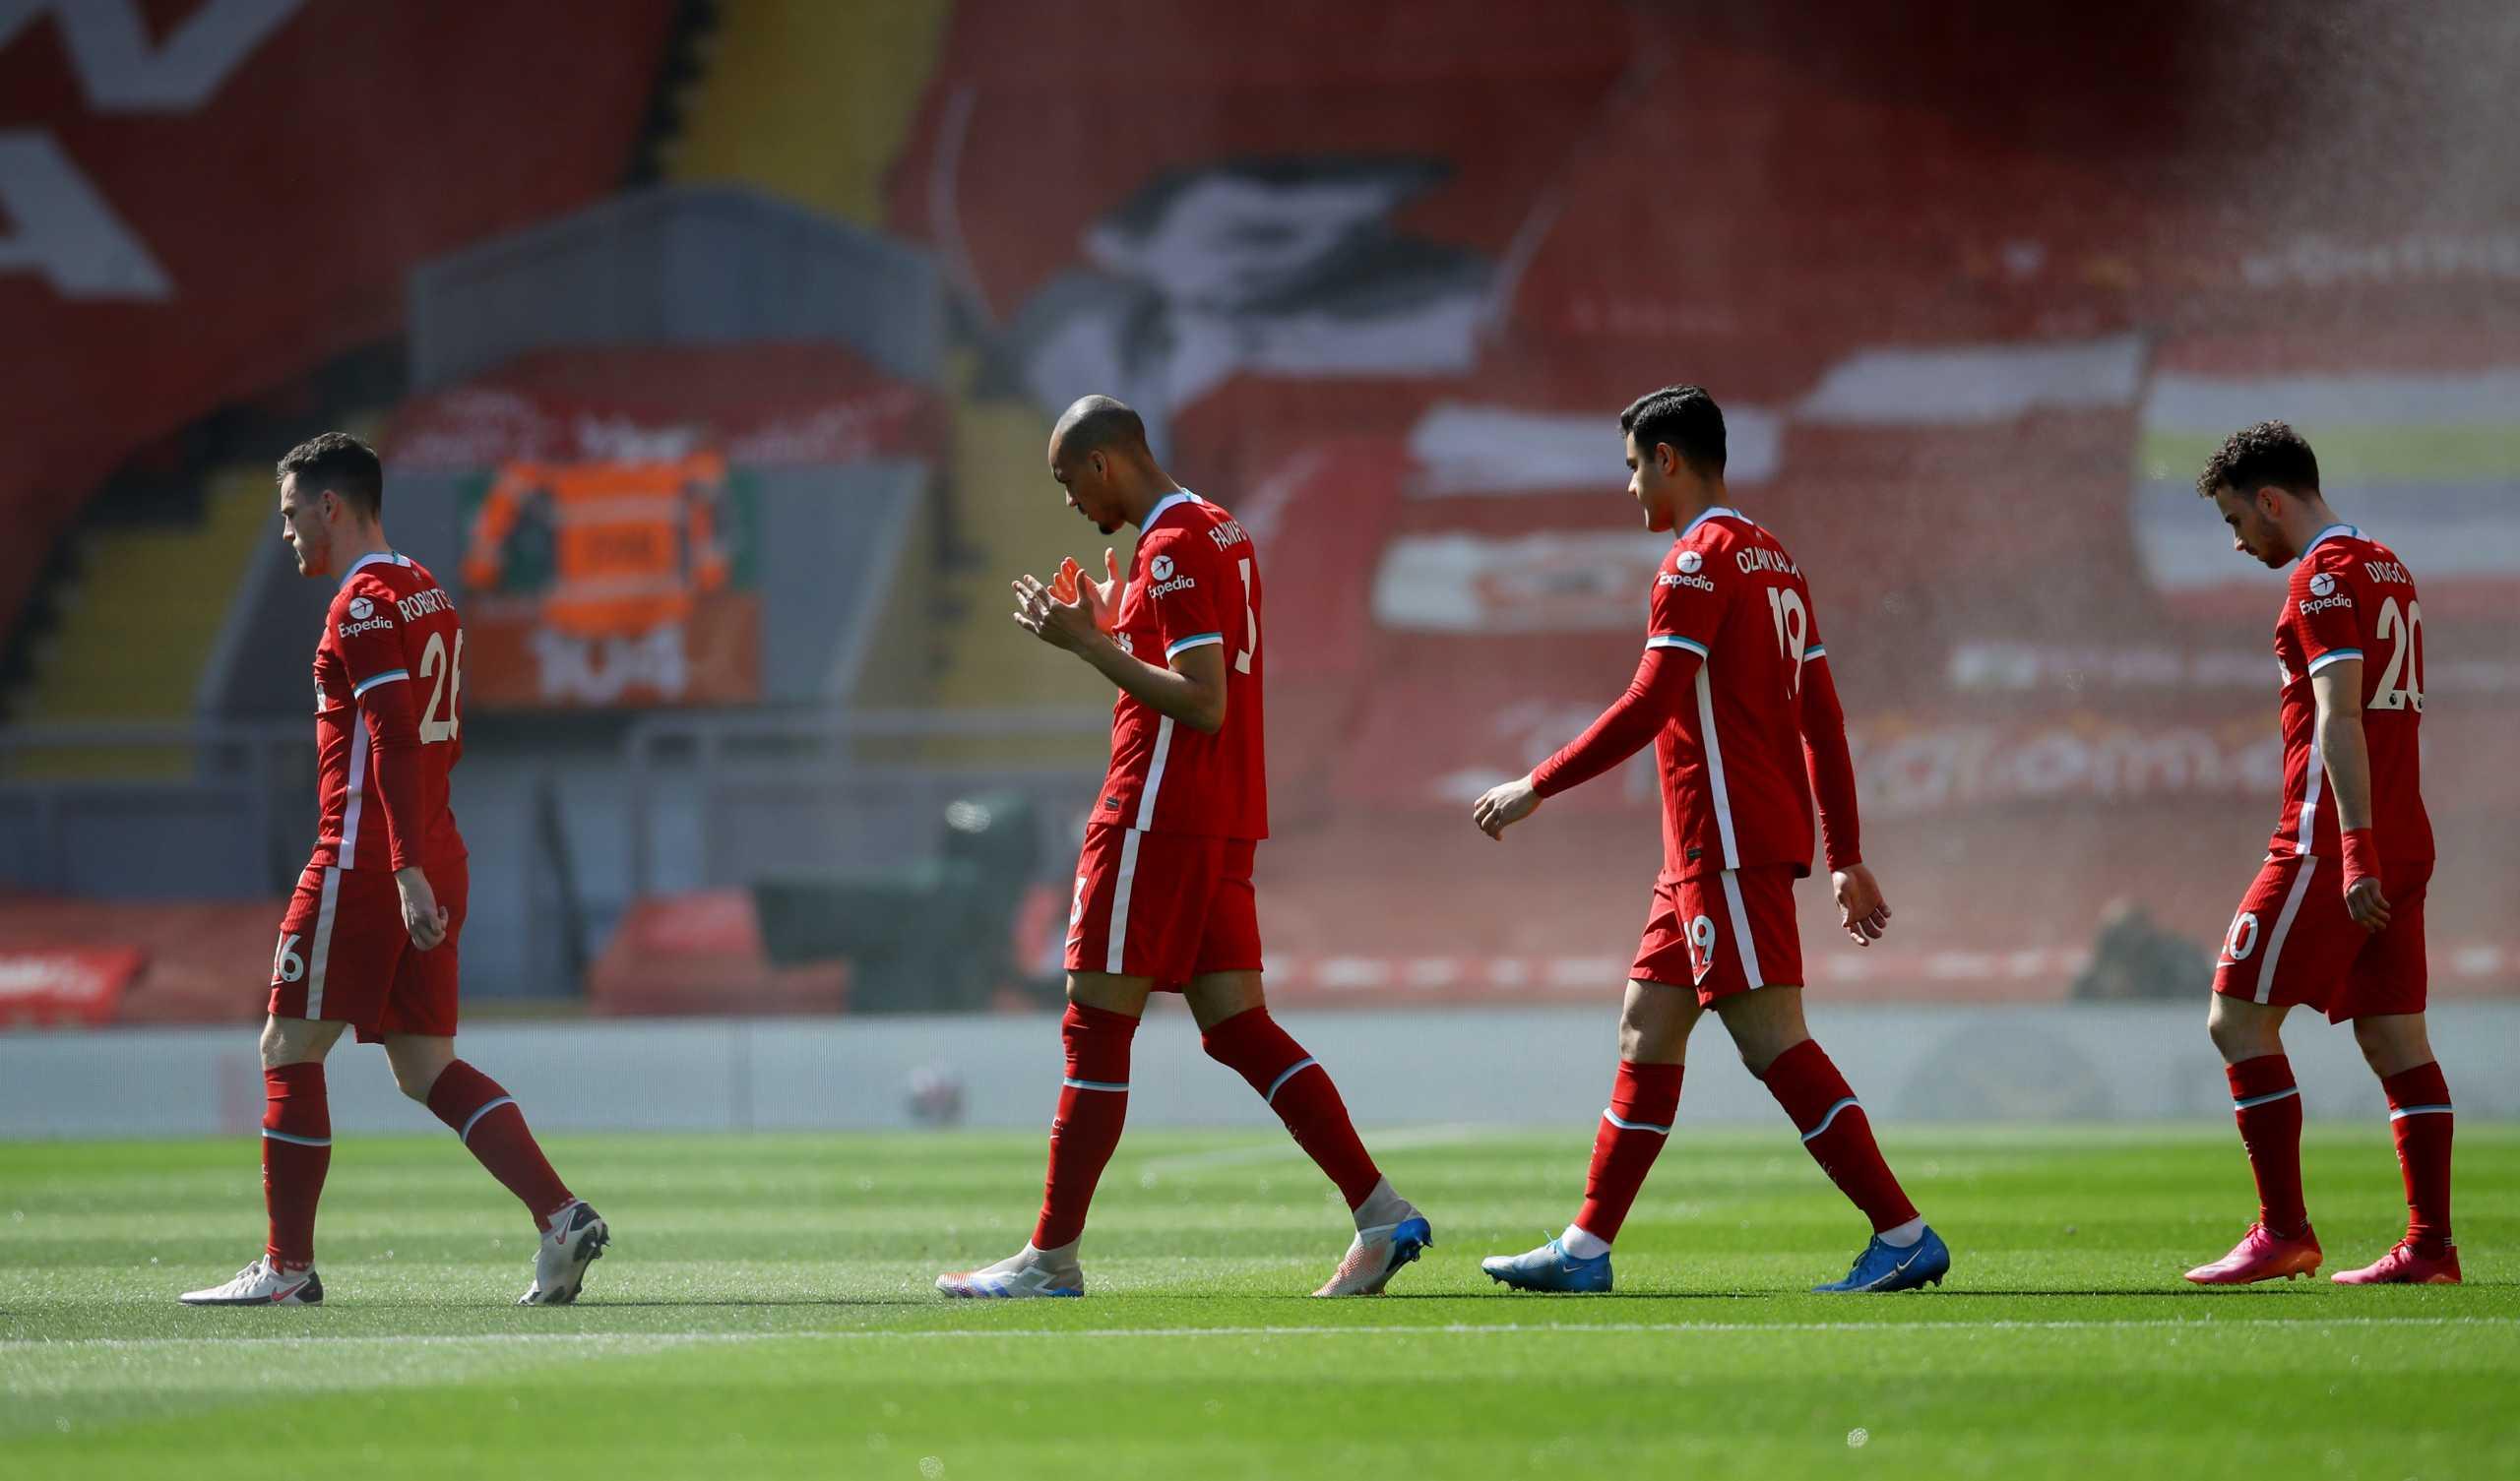 Premier League: Σοκ στο 95′ για τη Λίβερπουλ